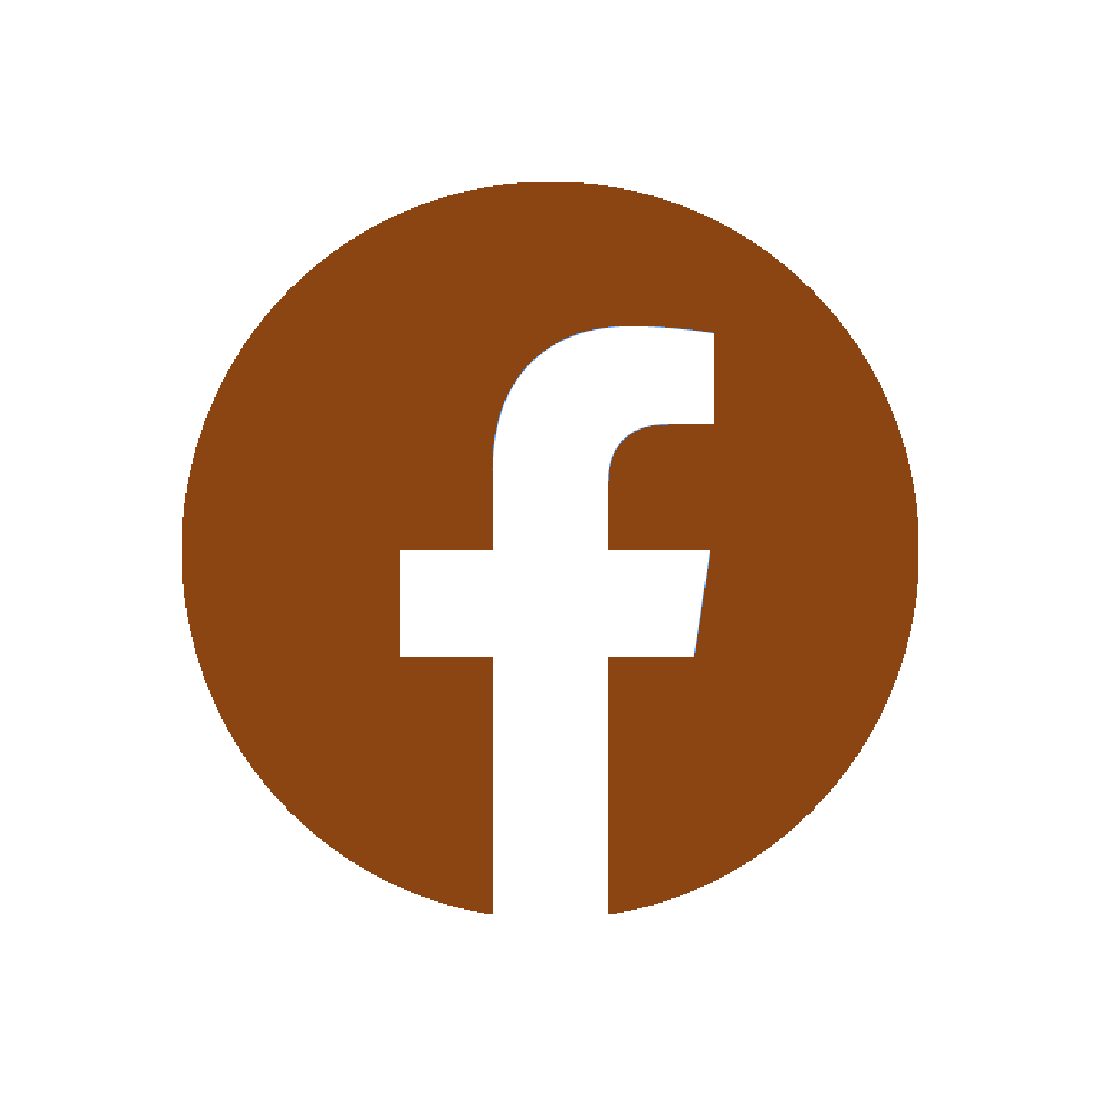 f_logo_sbr